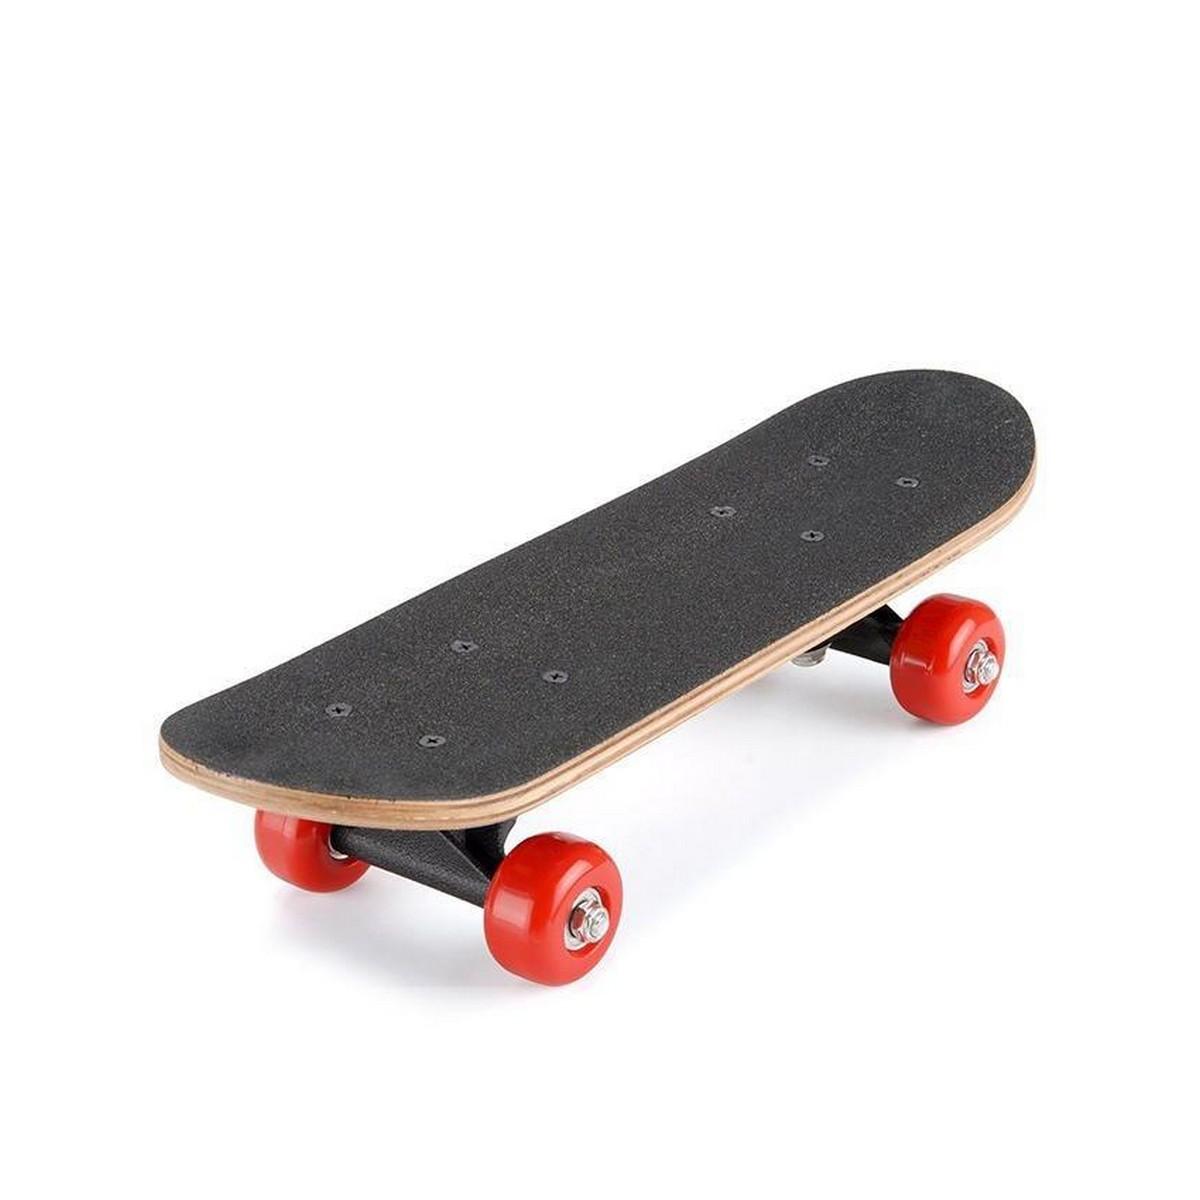 Skate Board - Small - Black & Red